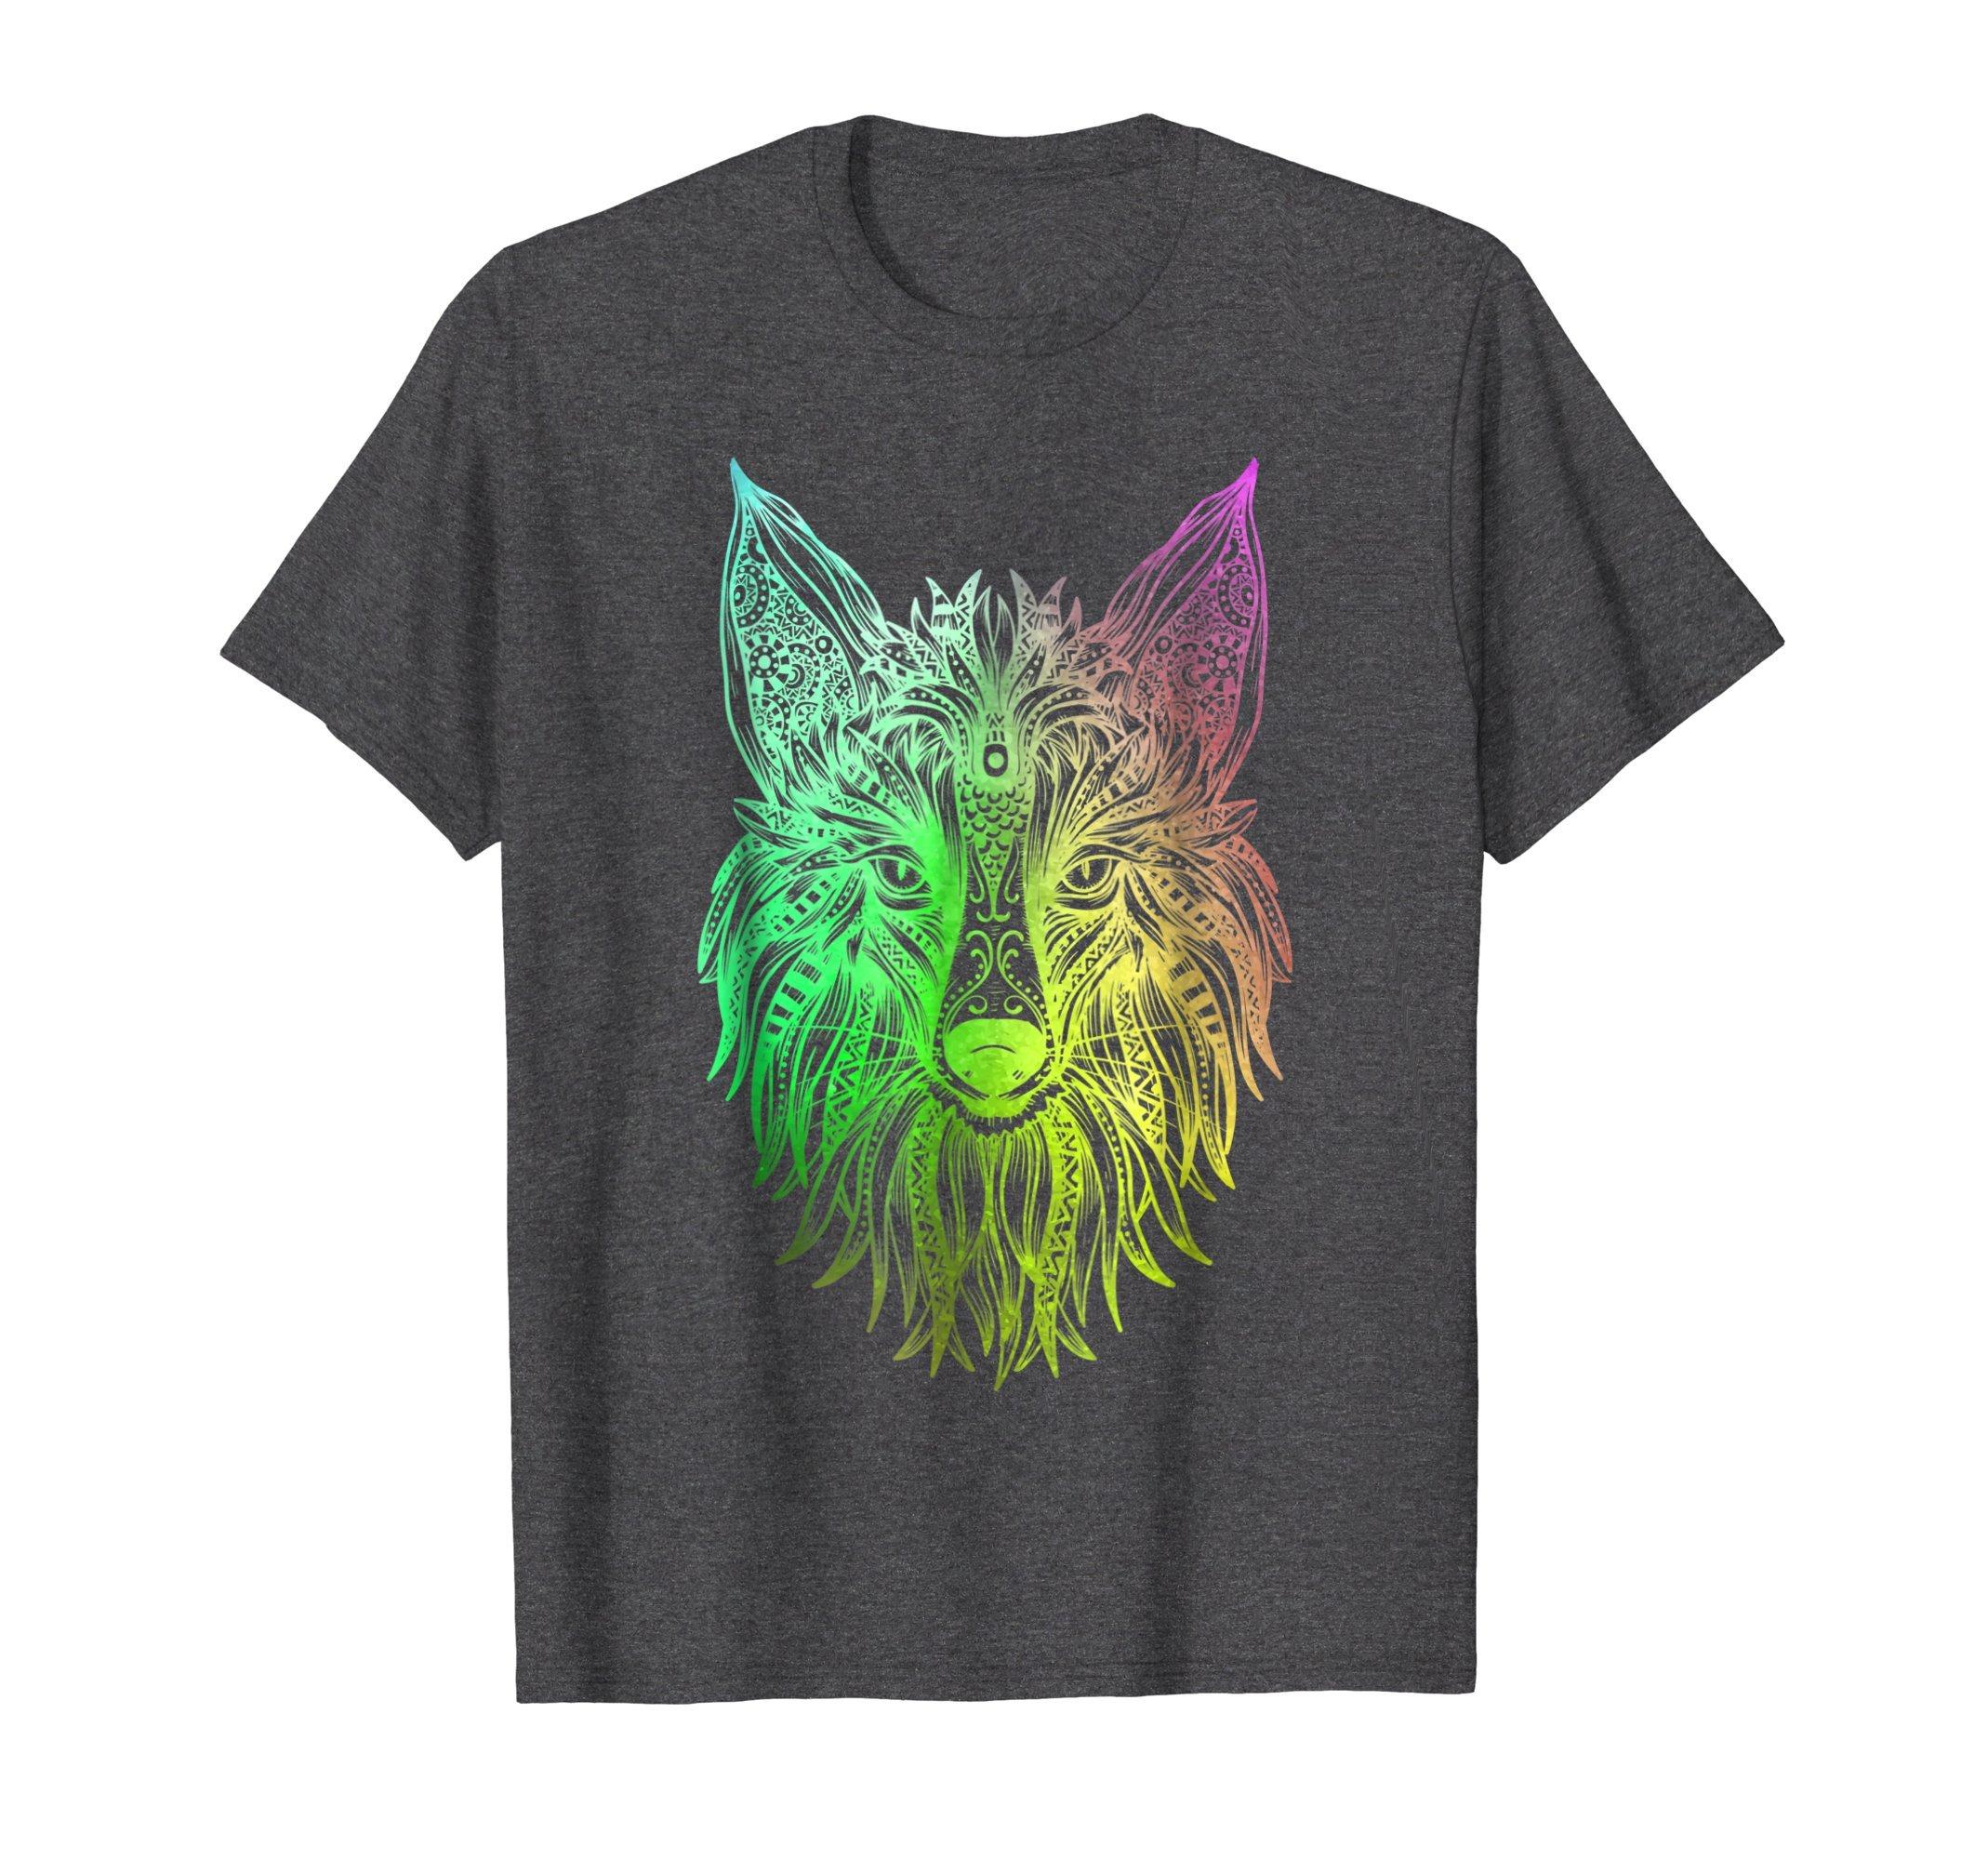 Mens Fox Hindu Tribal Watercolor Graphic T-shirt Gift Men Women Large Dark Heather